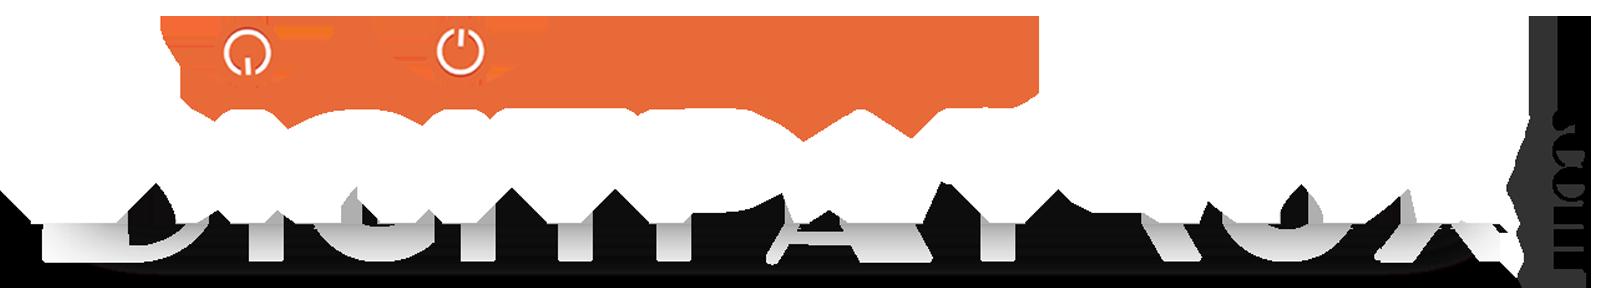 Digitpatrox Logo